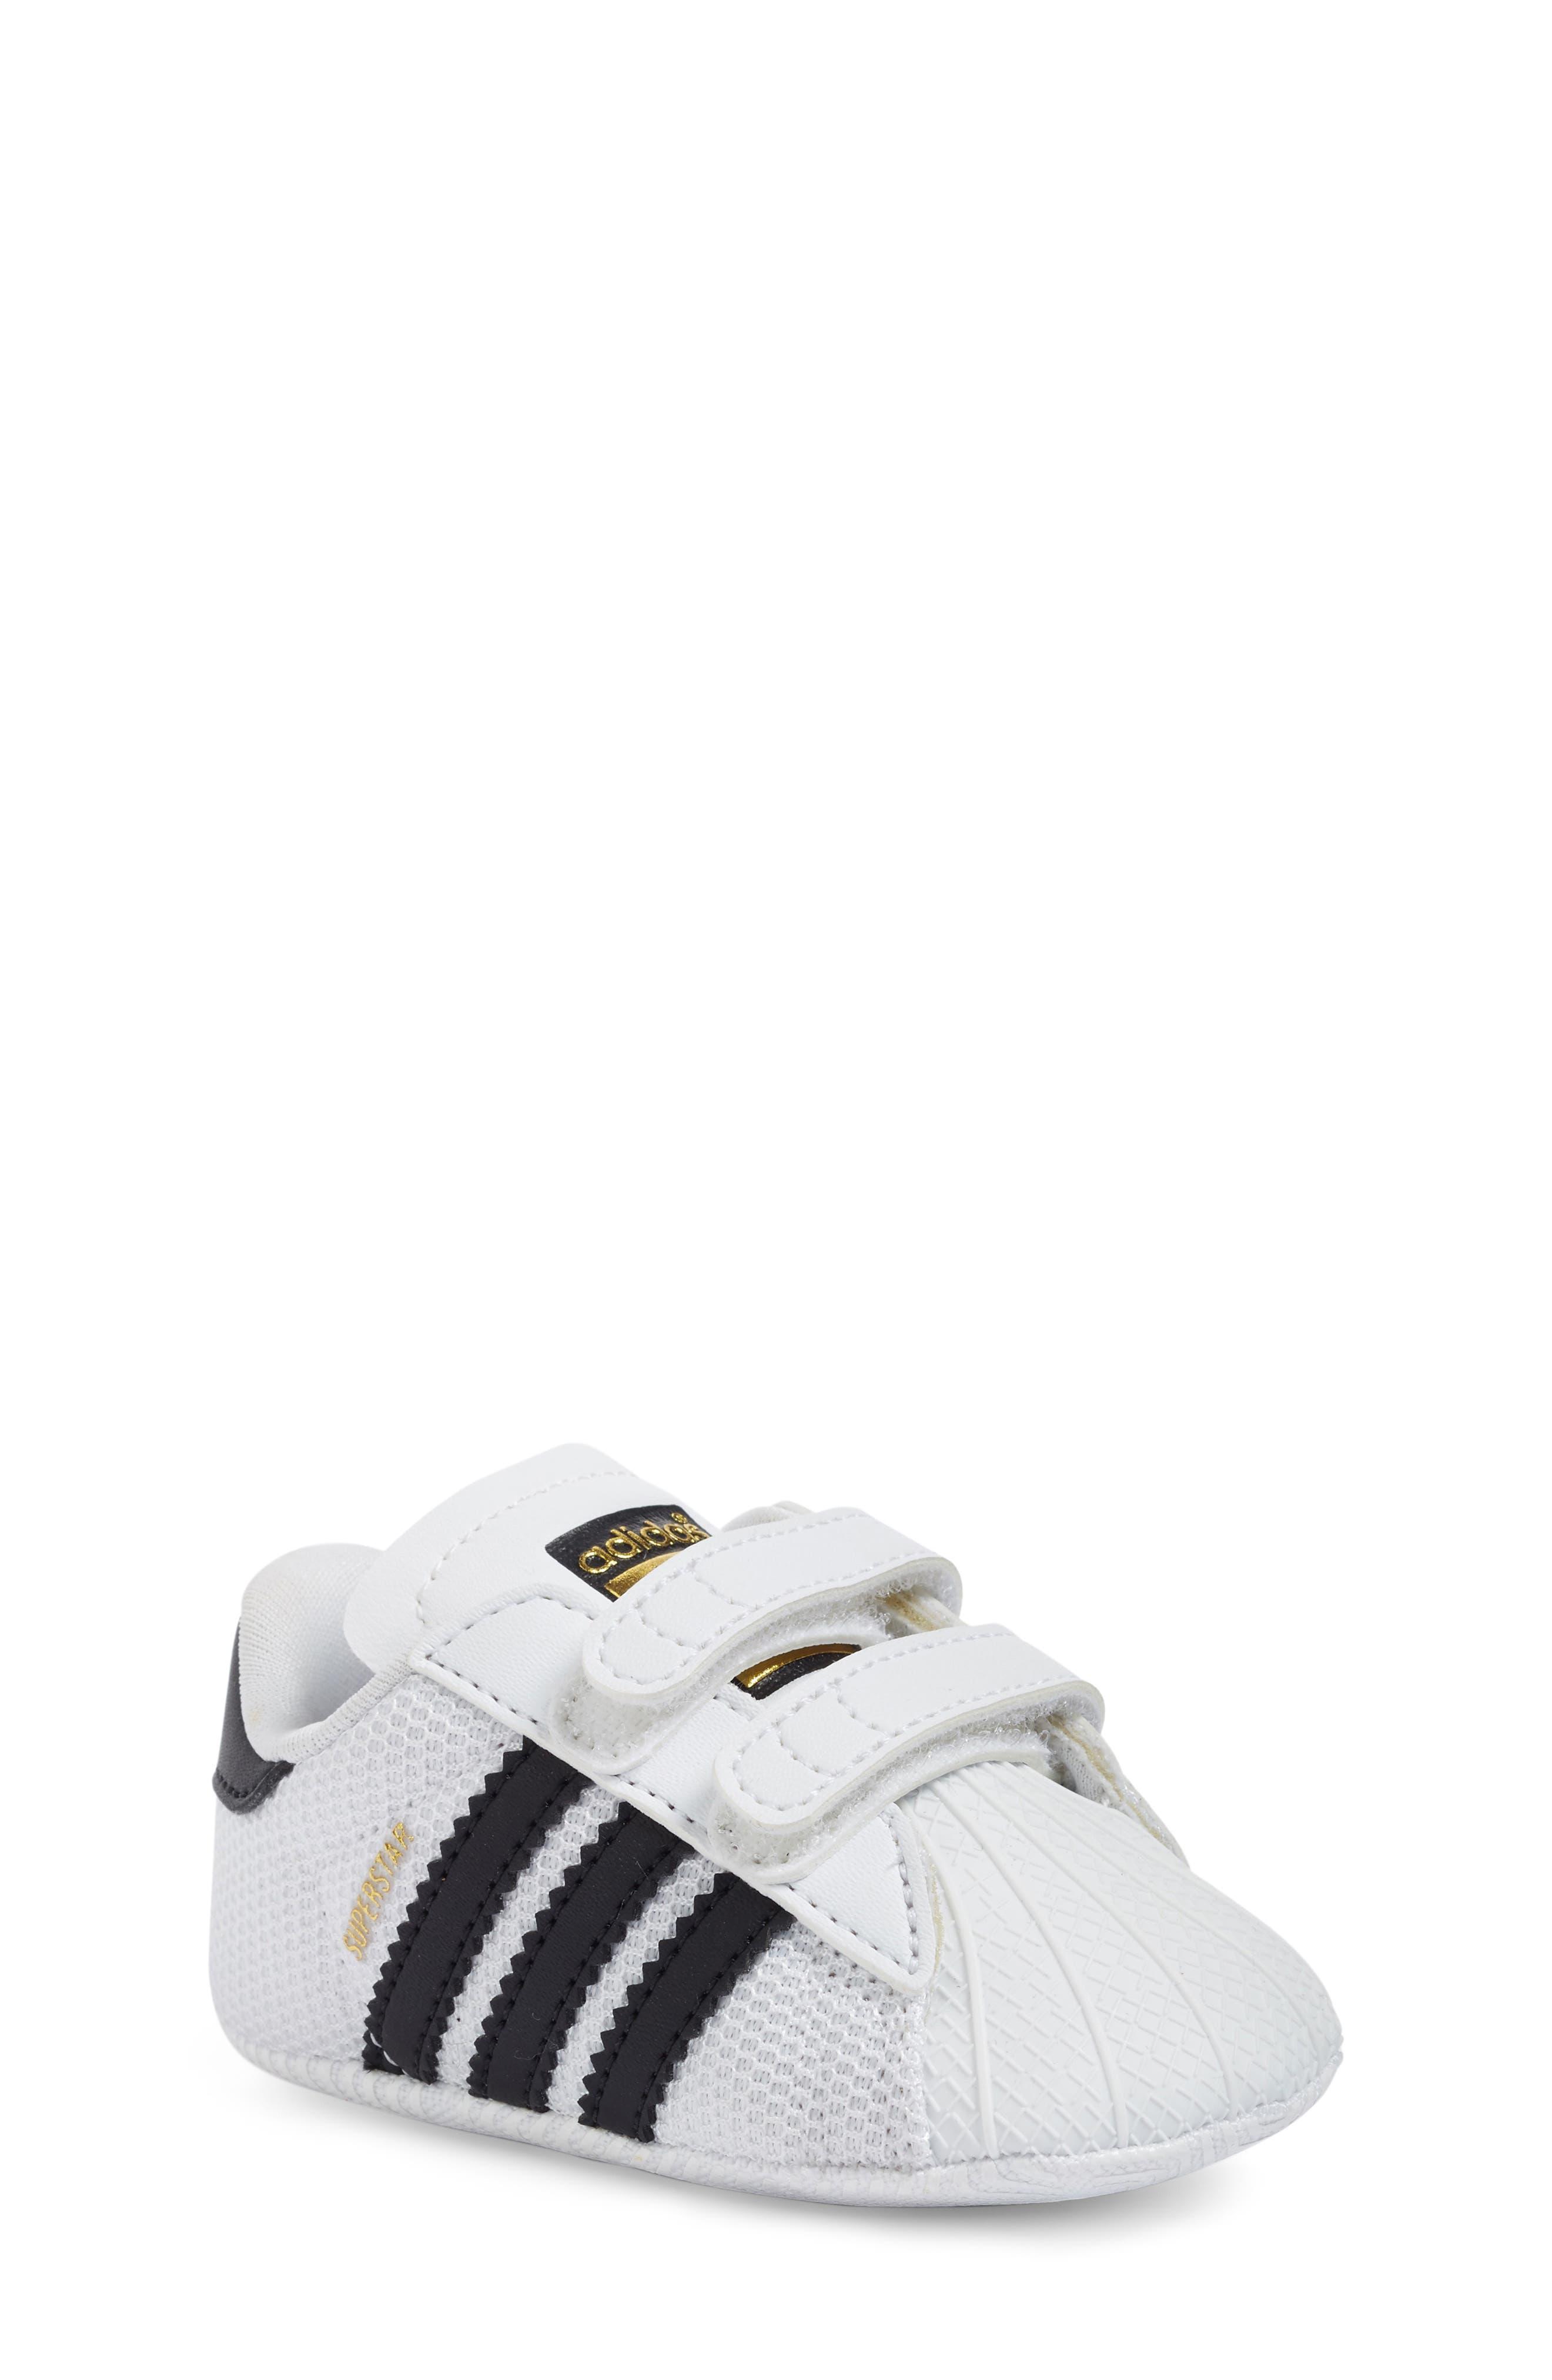 ADIDAS, Superstar Sneaker, Main thumbnail 1, color, WHITE/ BLACK